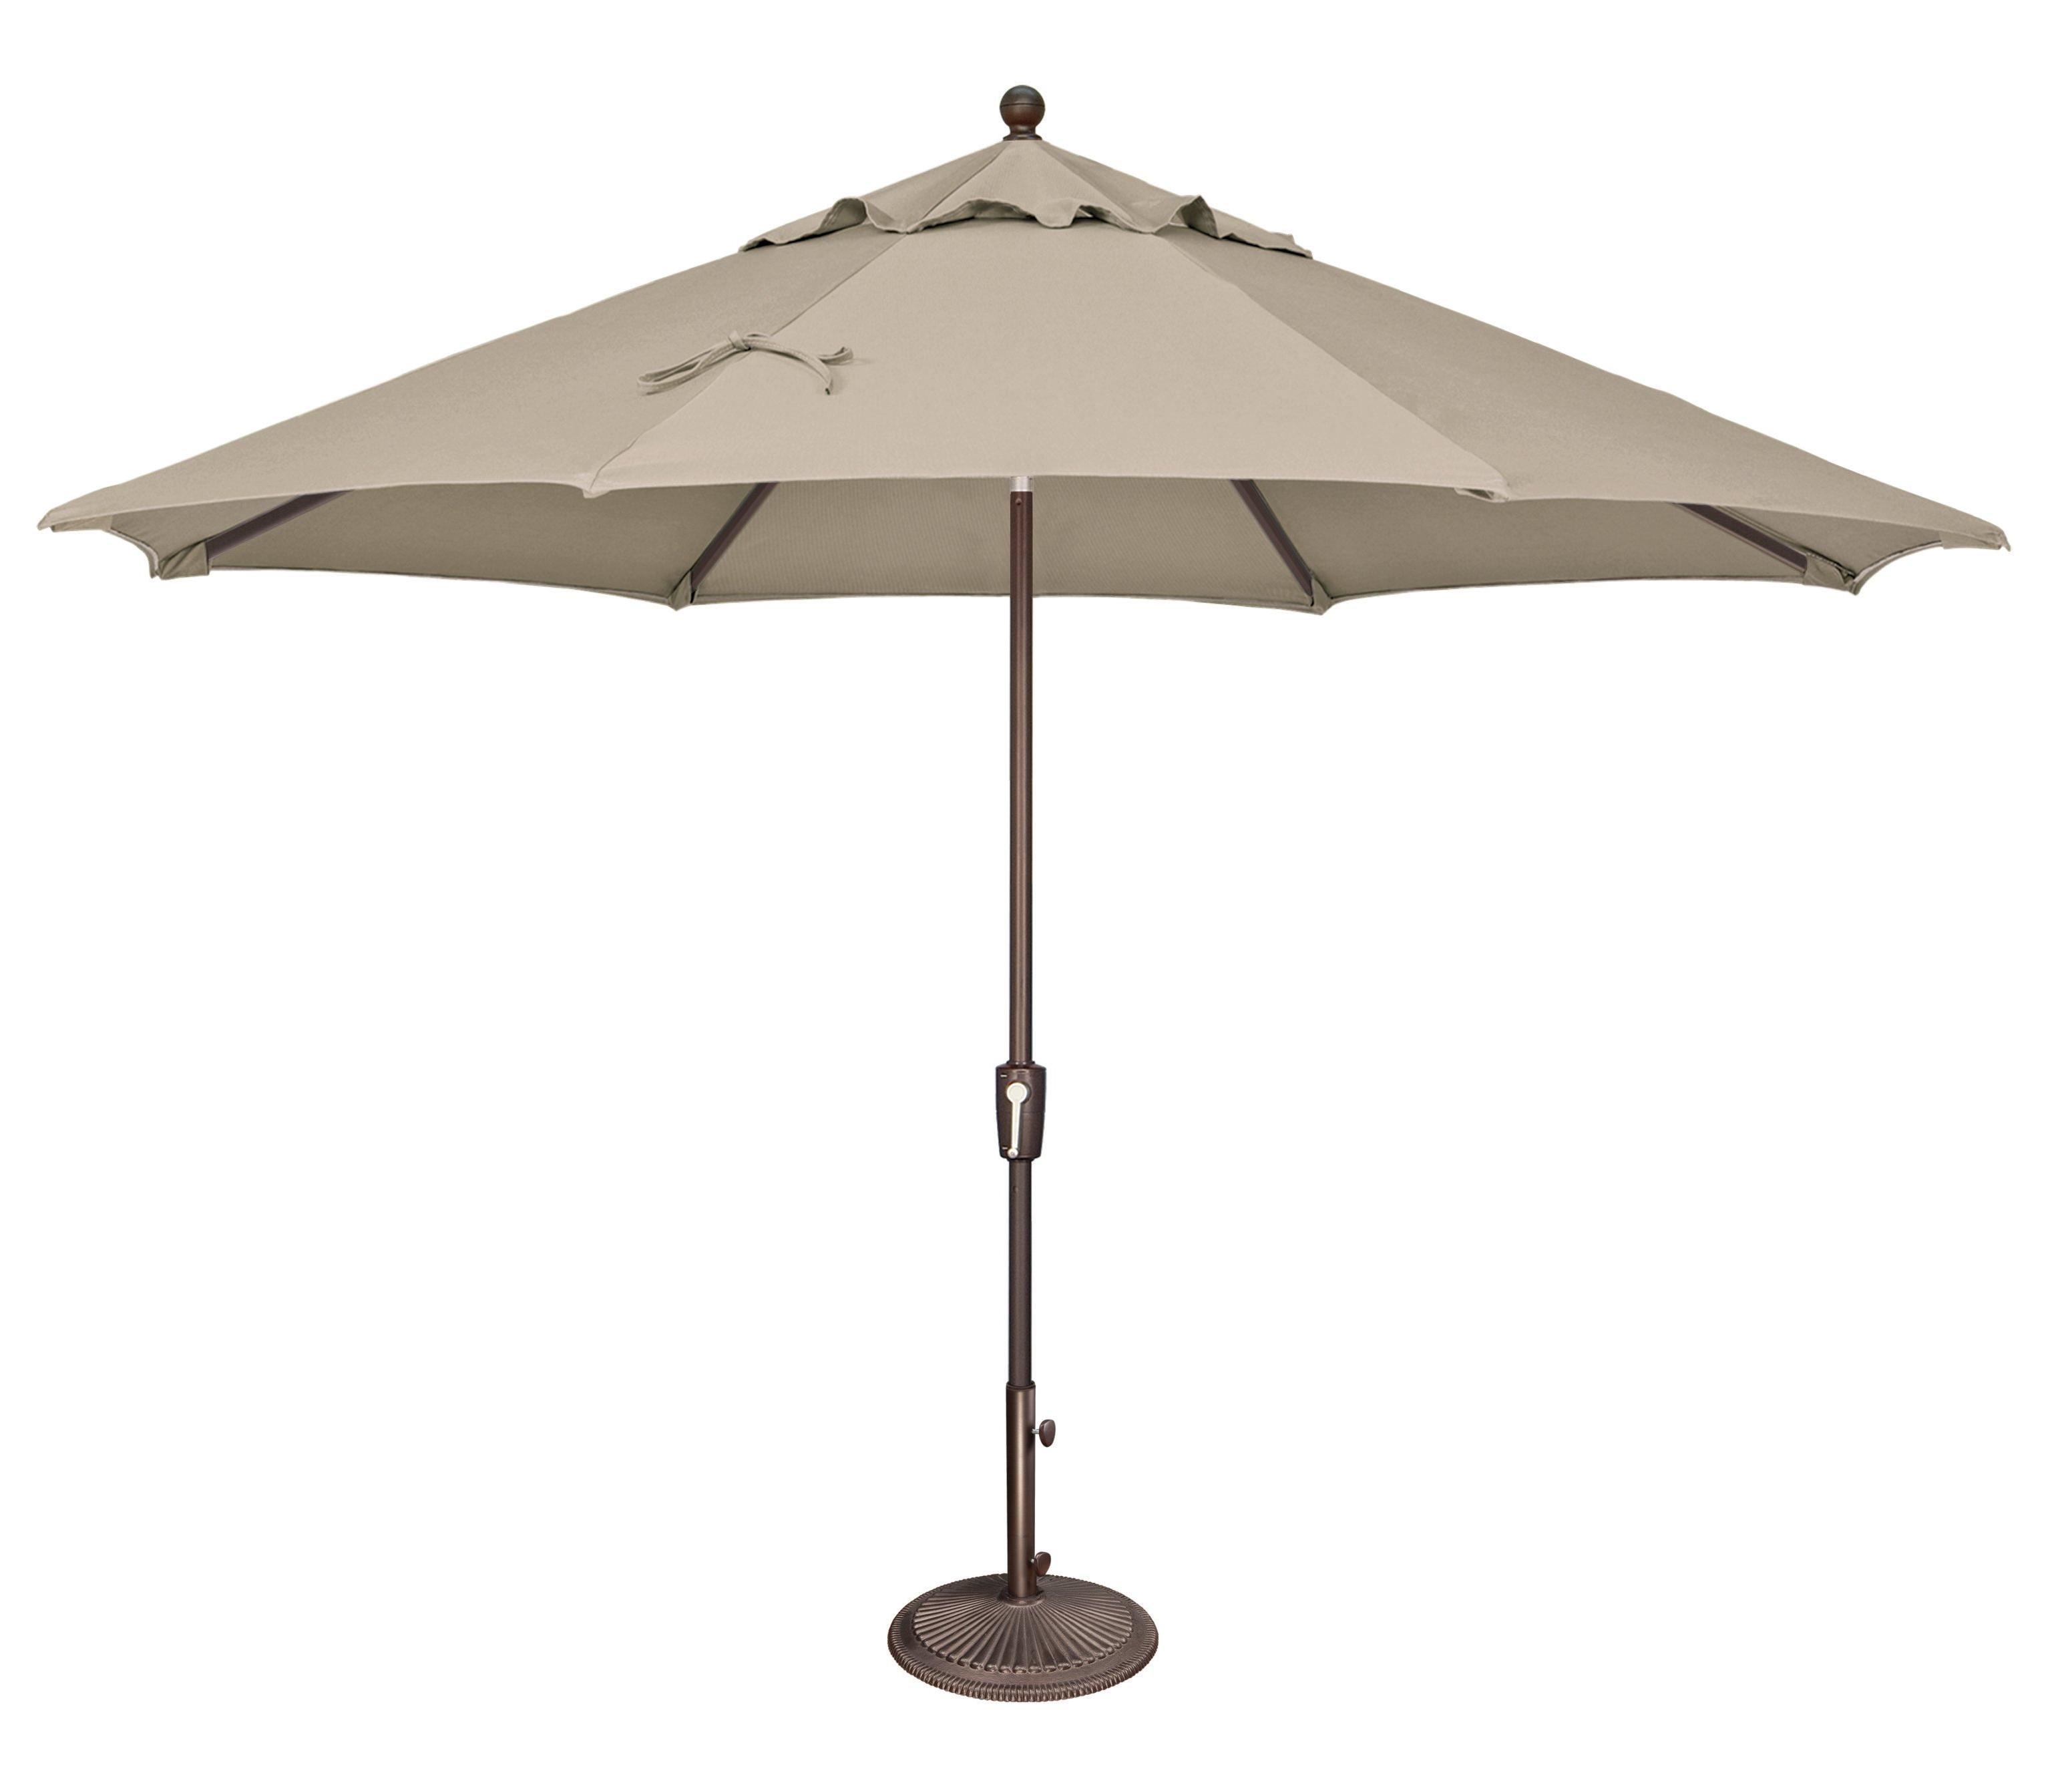 Devansh Market Umbrellas Intended For Latest Launceston 11' Market Umbrella (View 7 of 20)